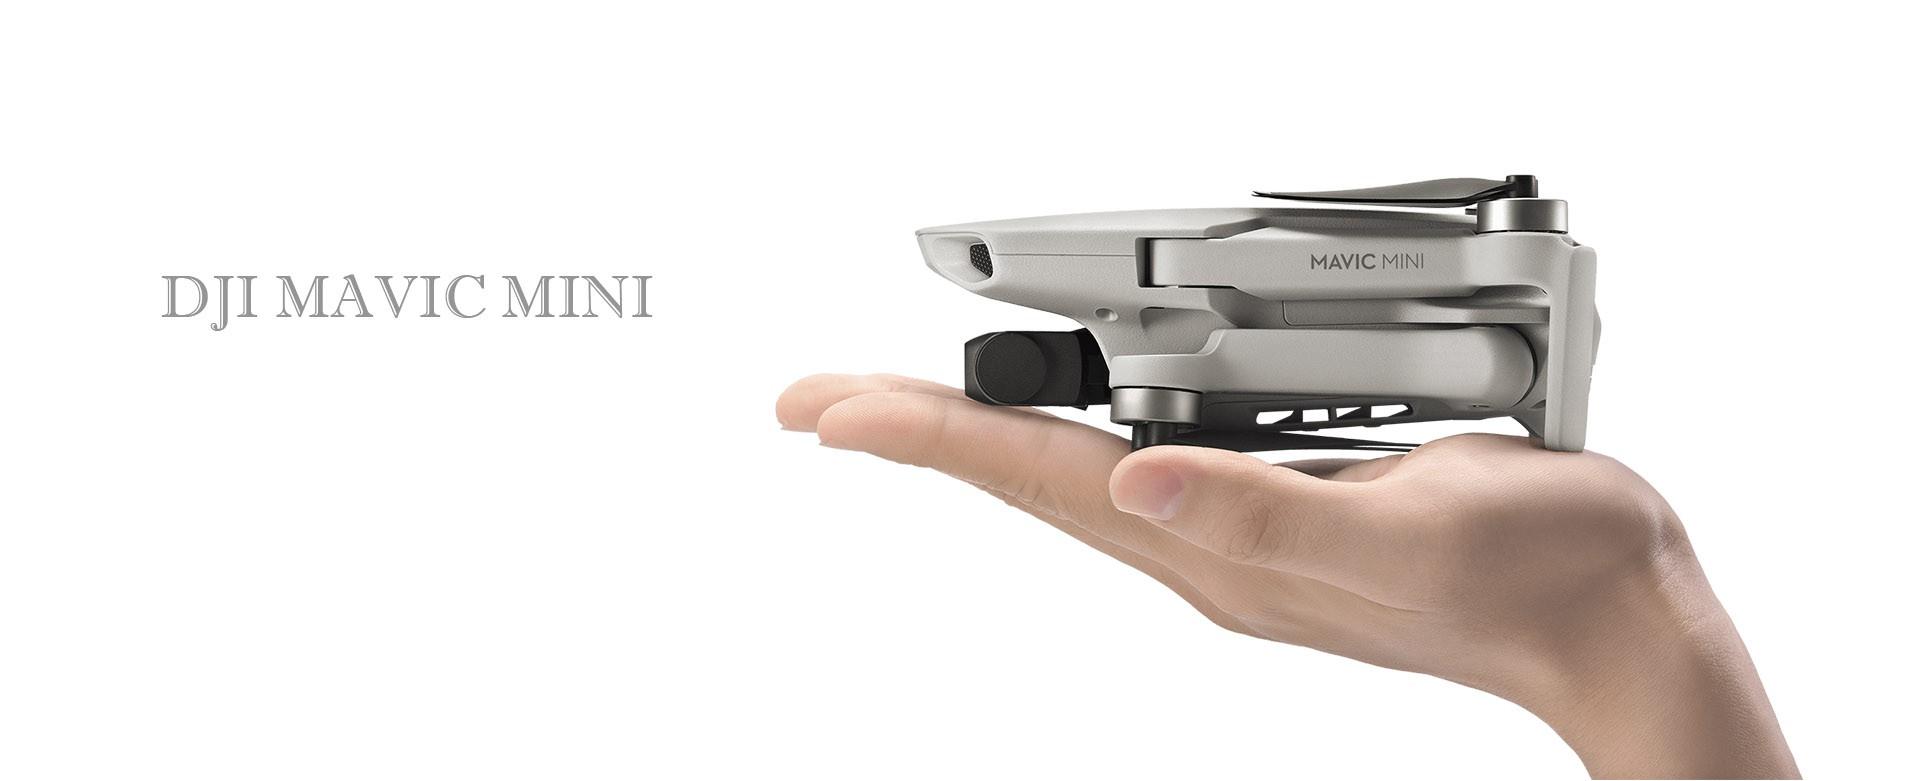 Mavic Mini Drone | AeroCam.bg